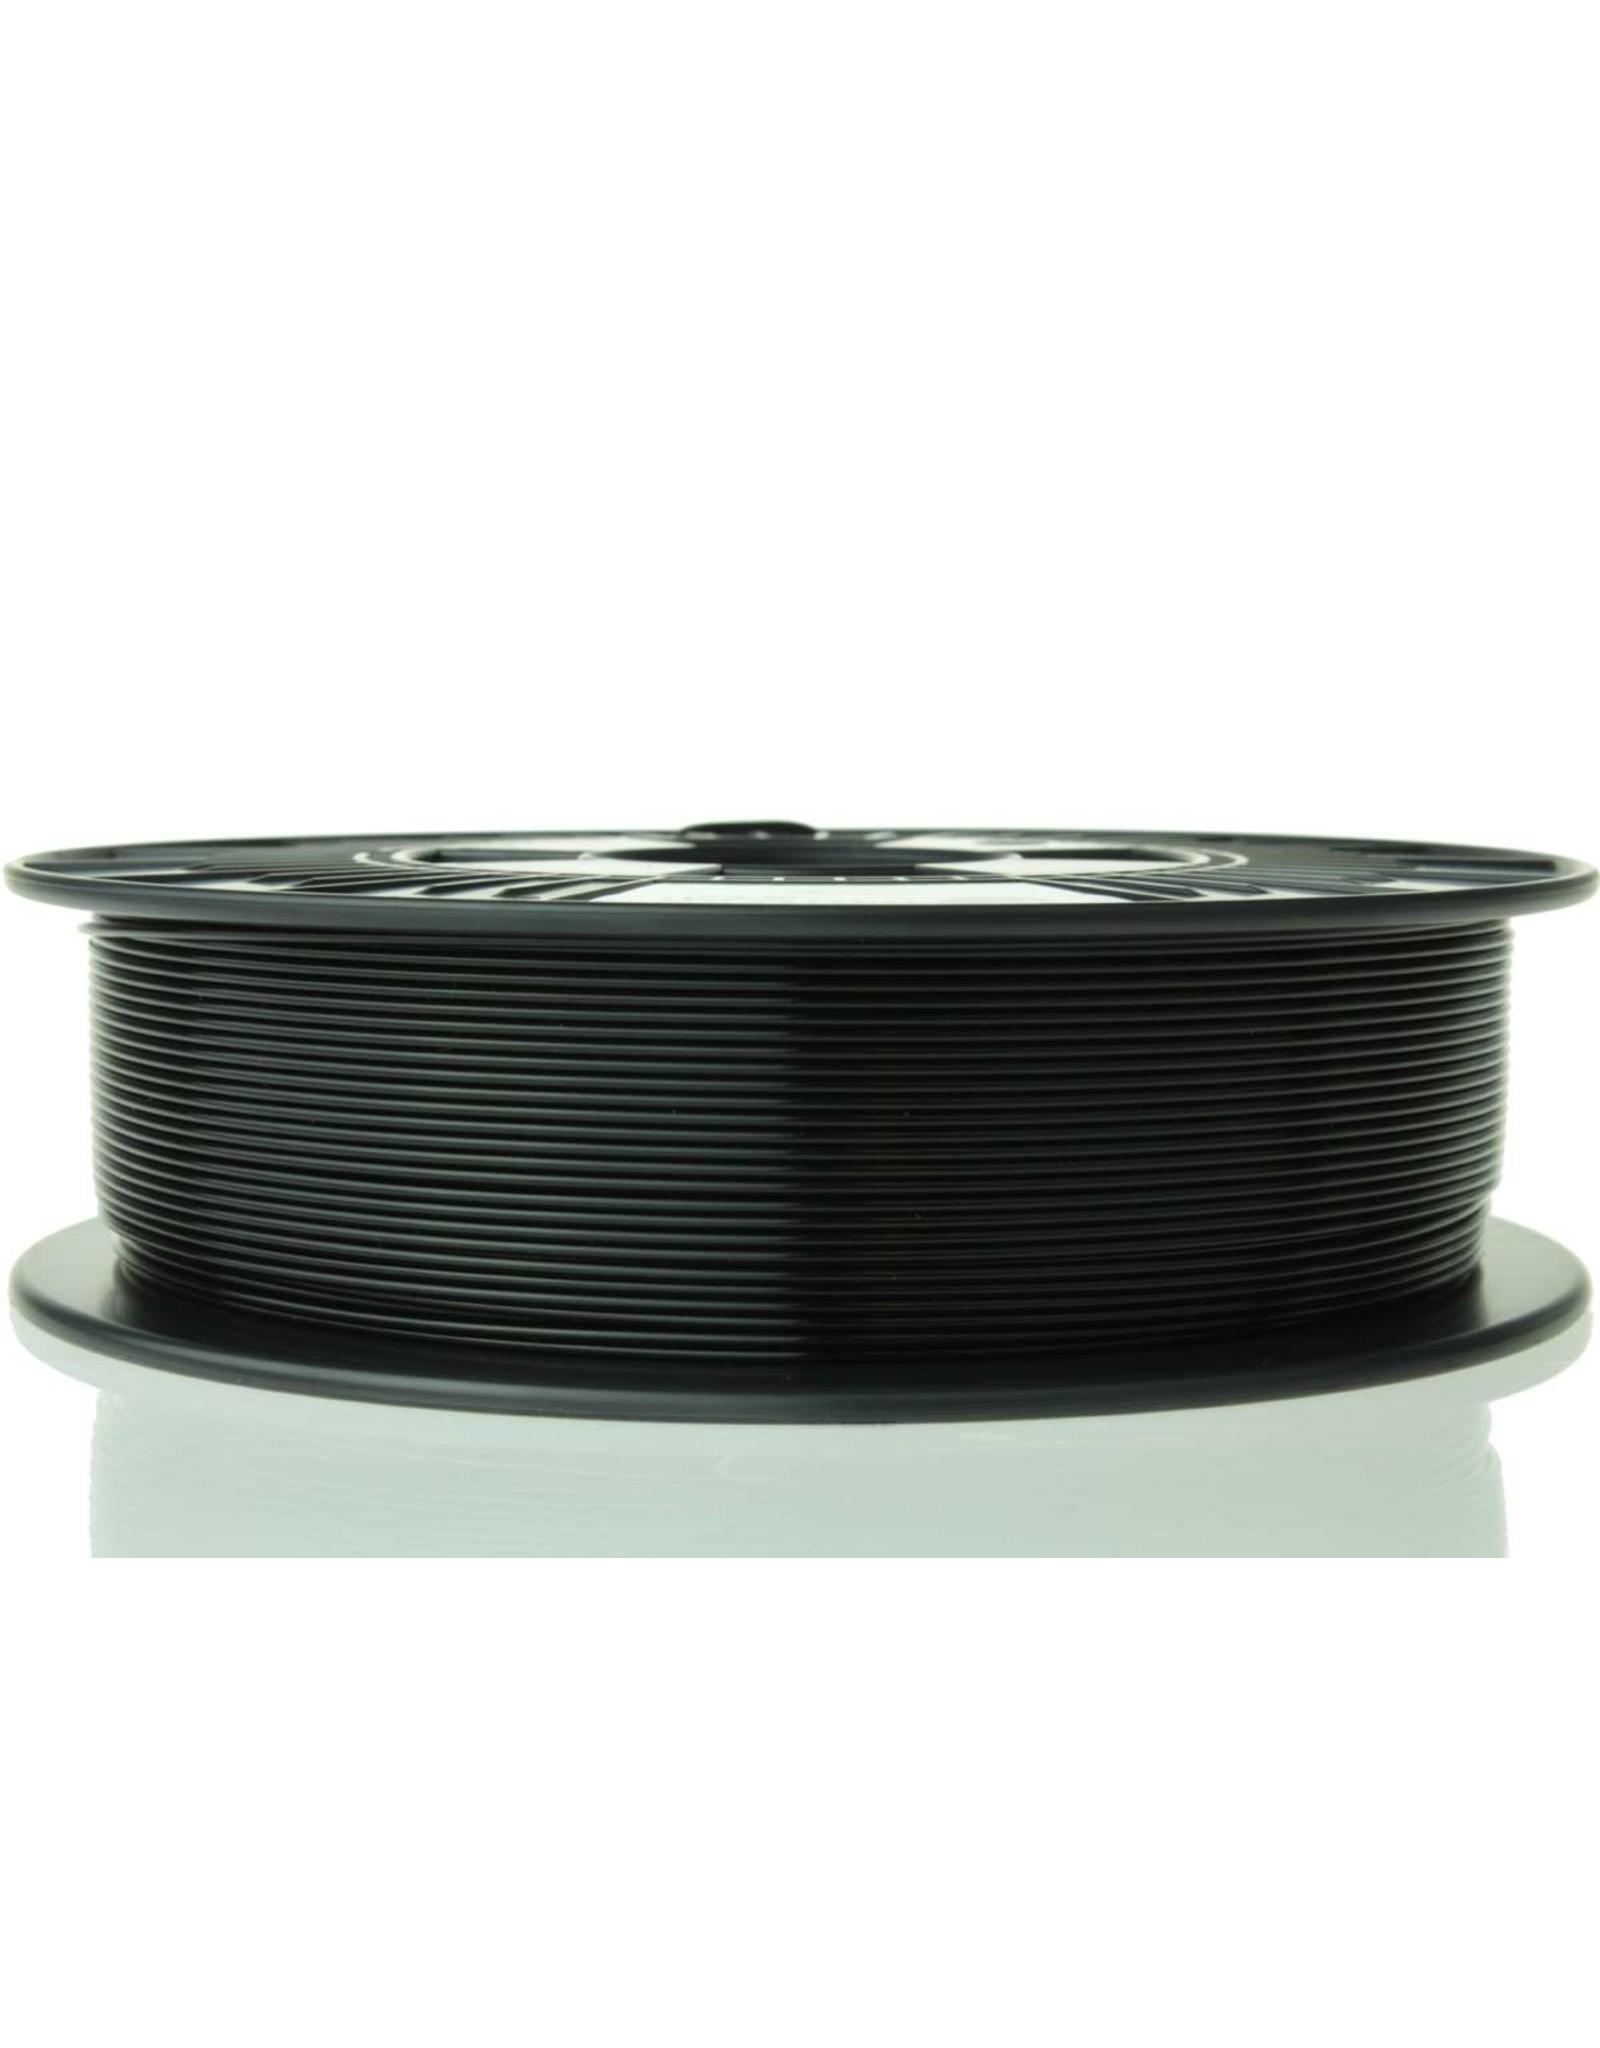 Material4Print PMMA  Filament 1.75mm 1KG